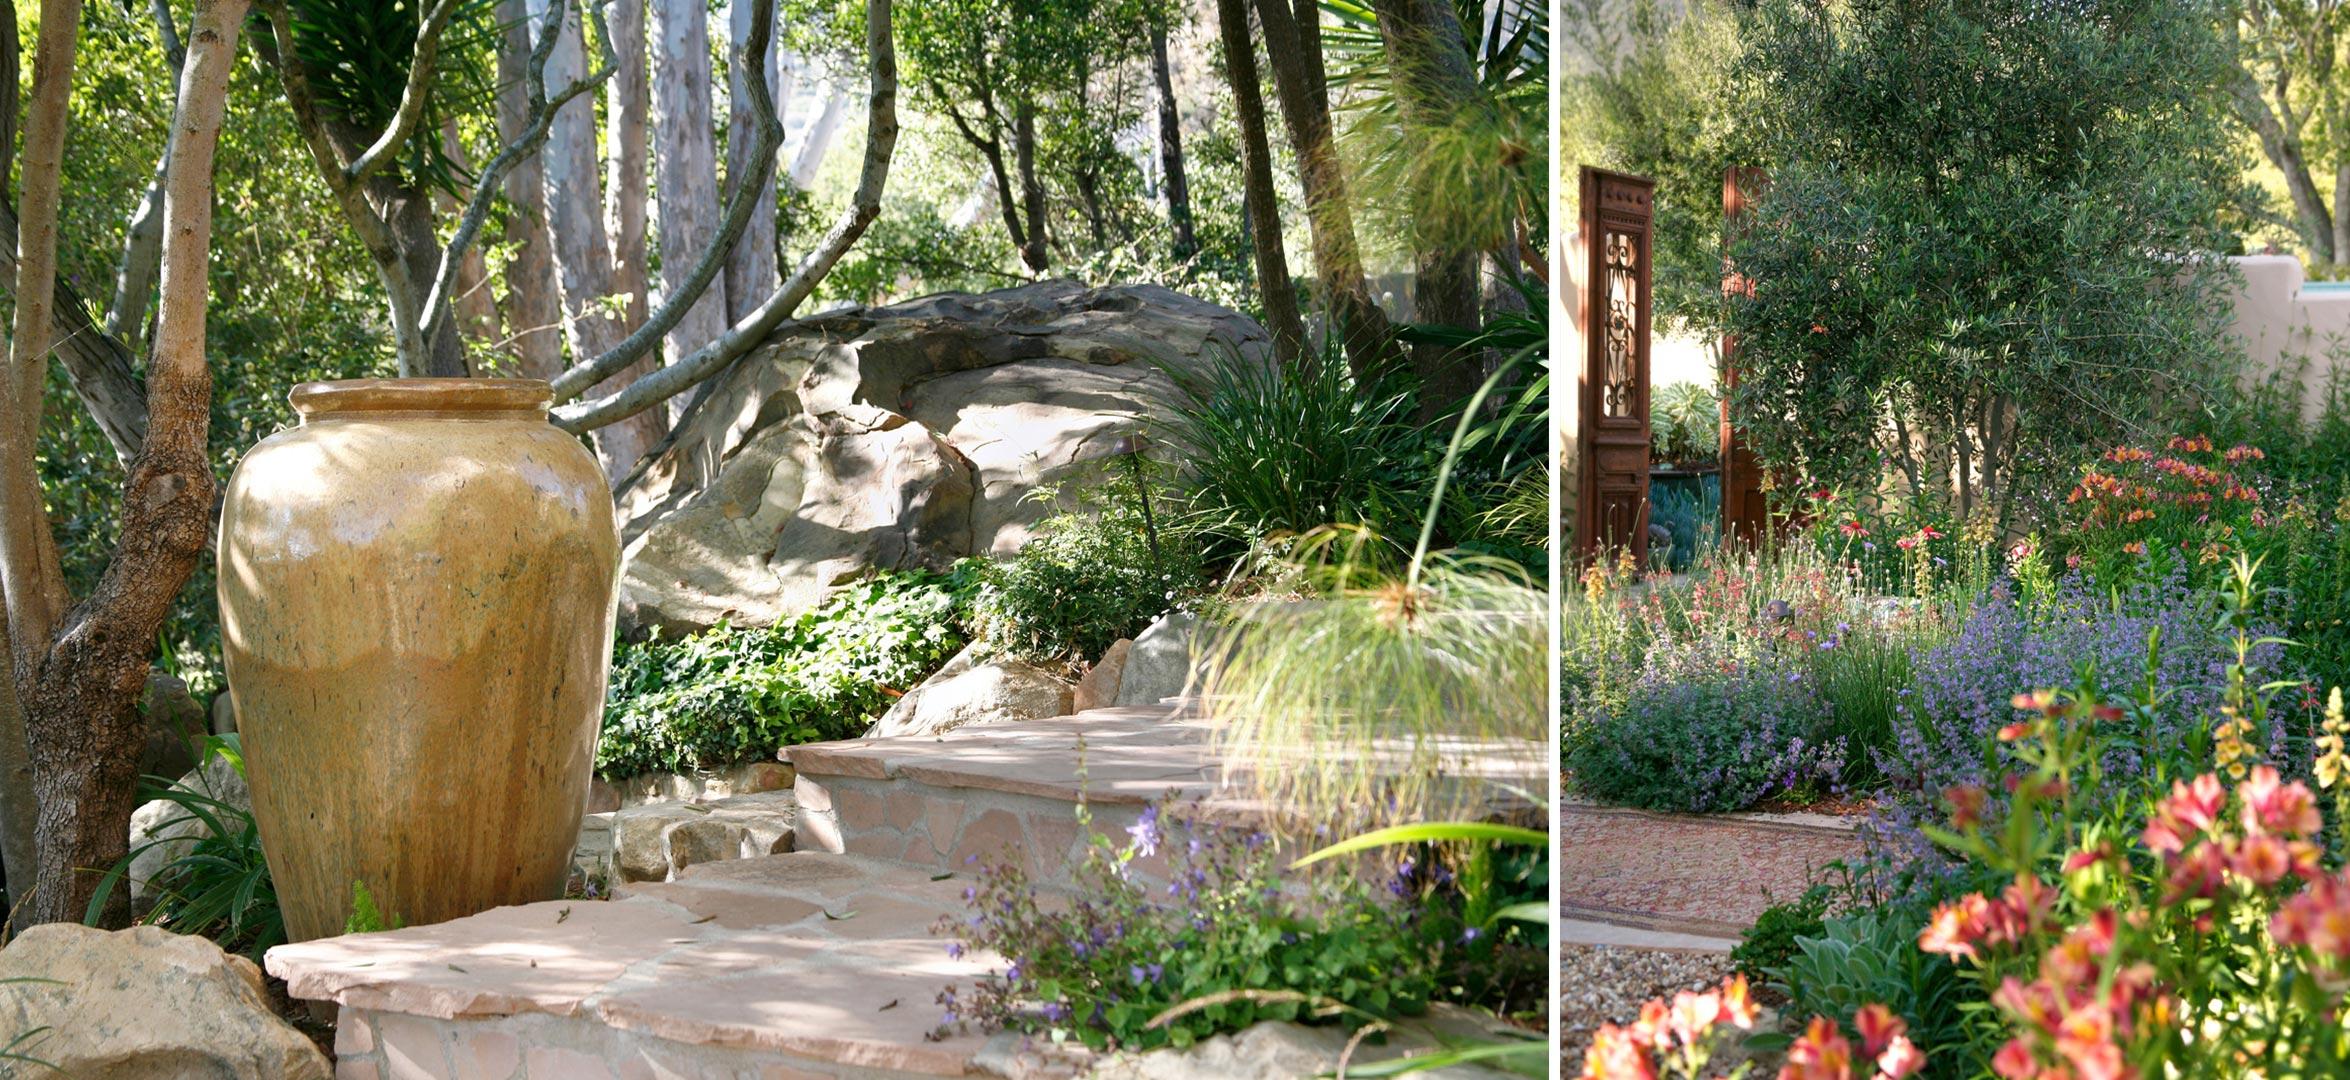 4-stone-steps-flower-beds.jpg